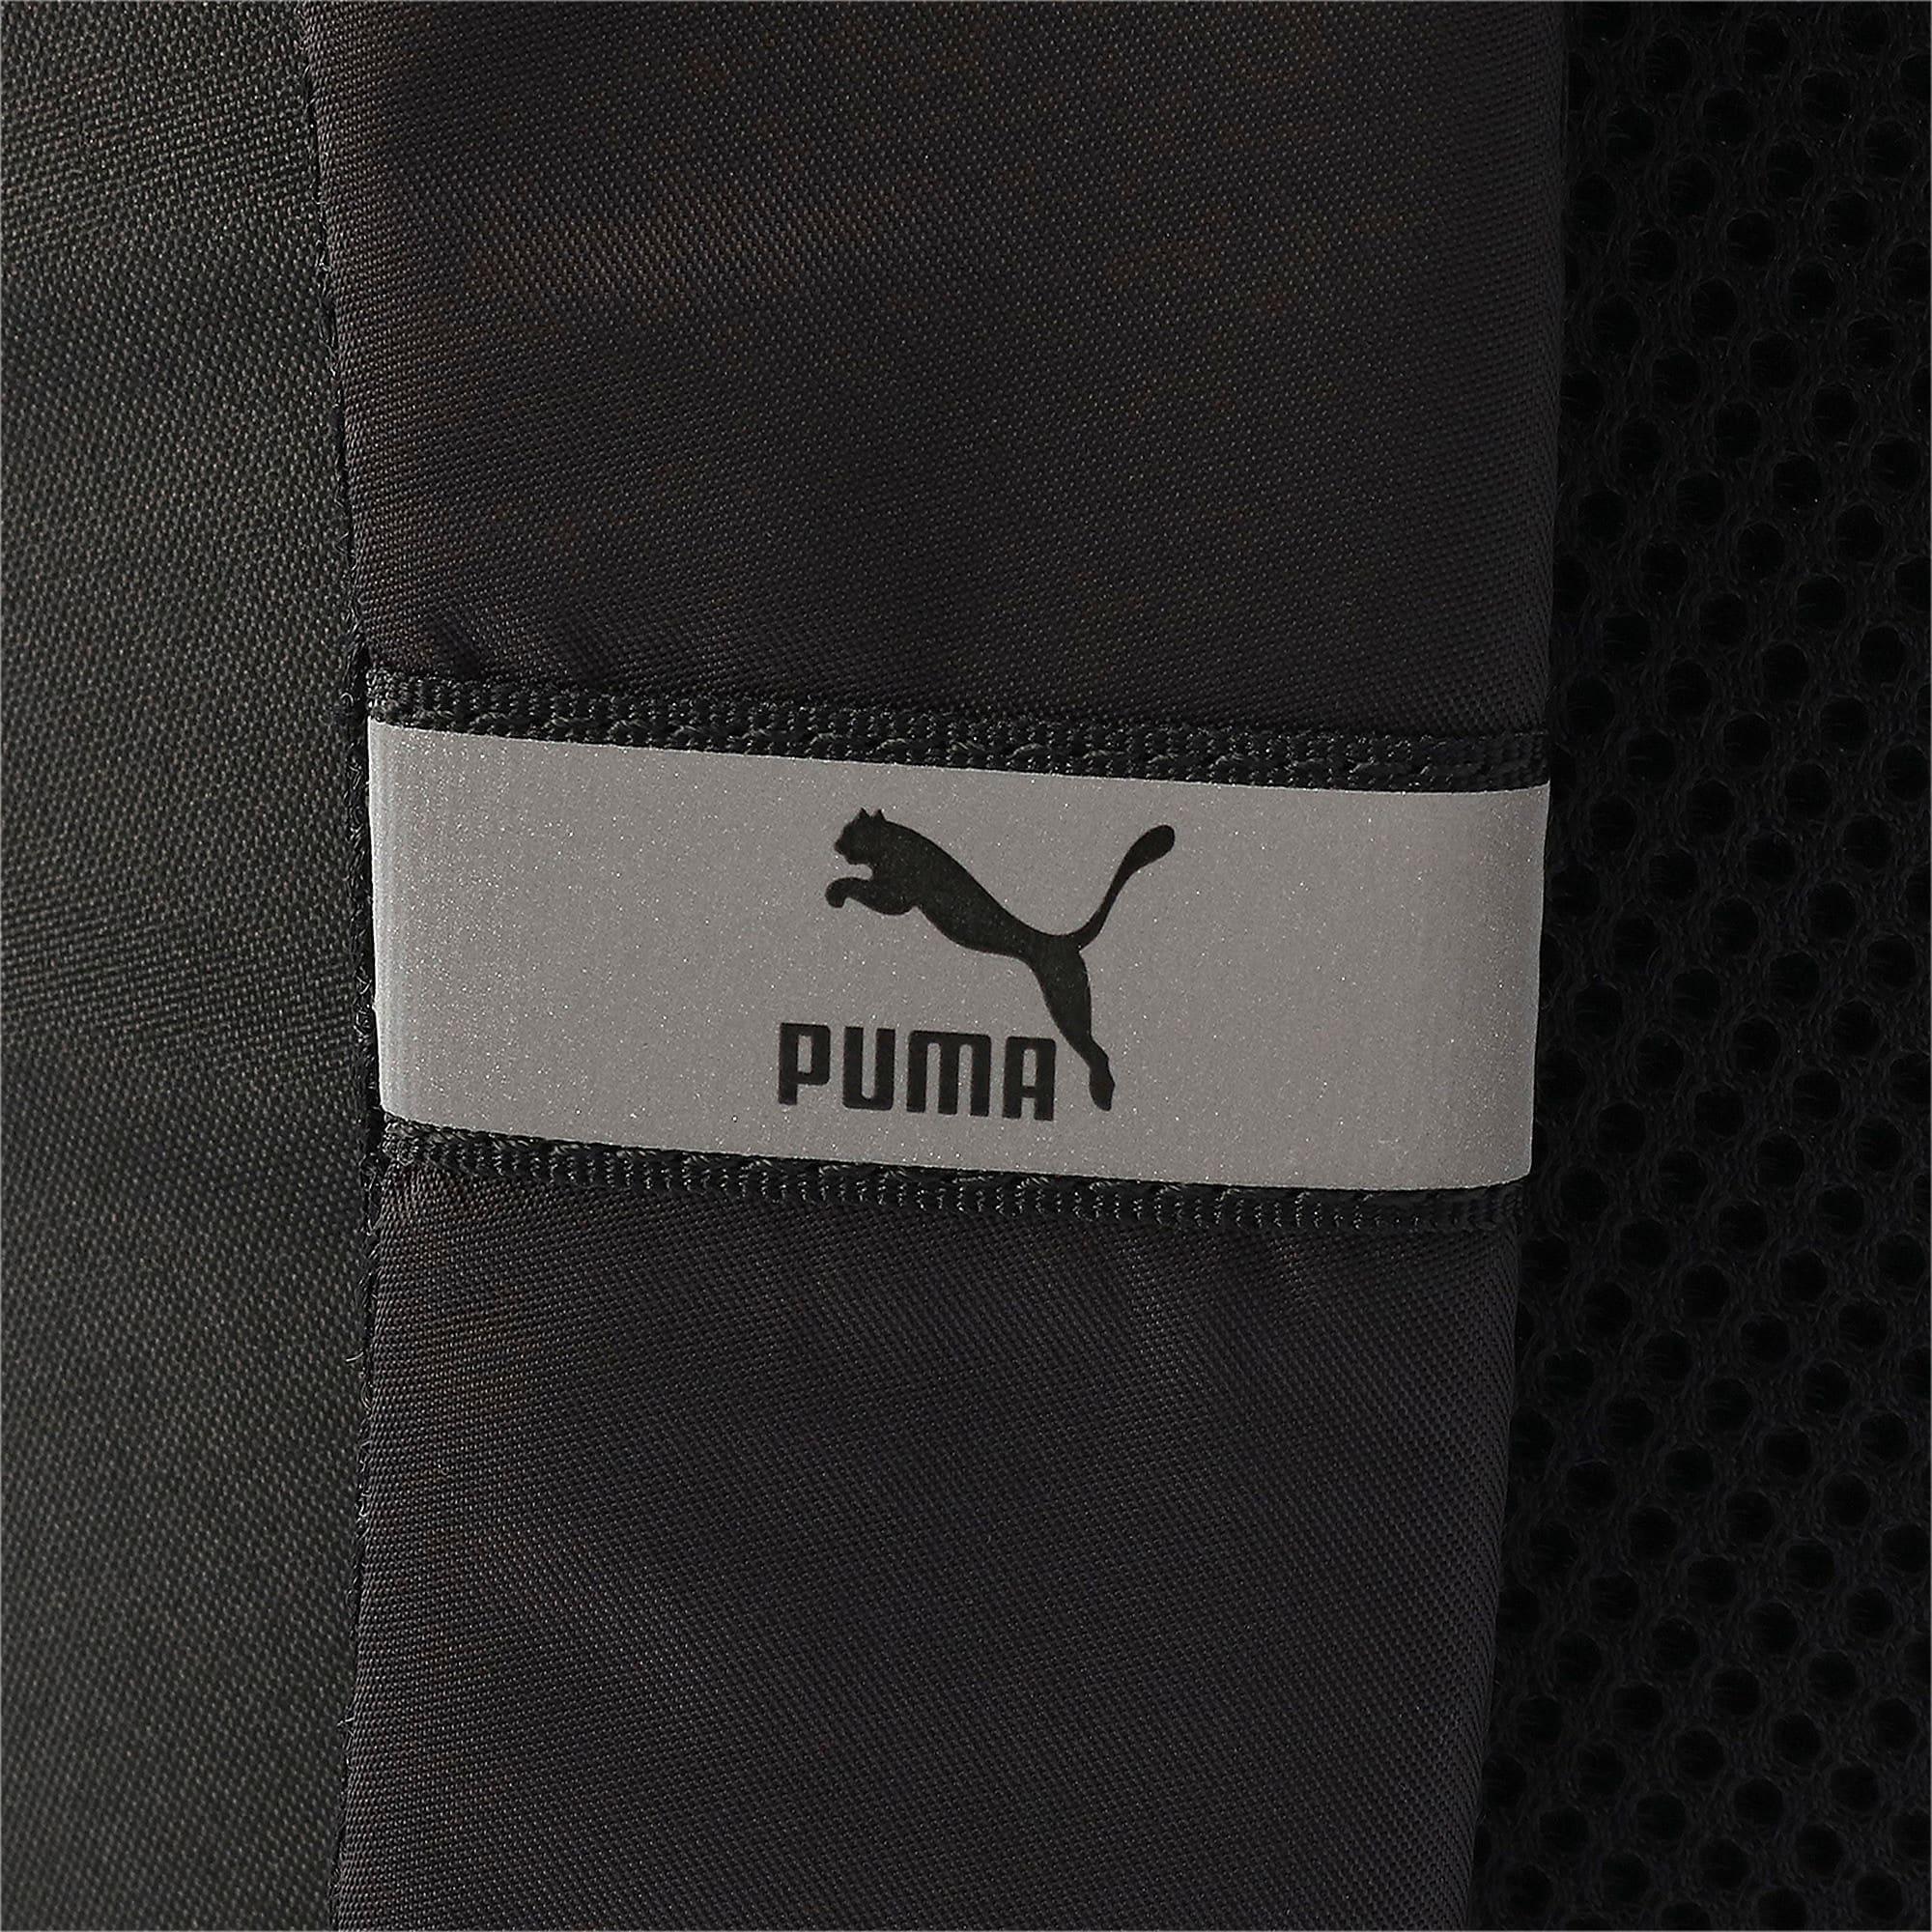 Thumbnail 10 of オリジナルス バックパック トレンド 24L, Puma Black, medium-JPN